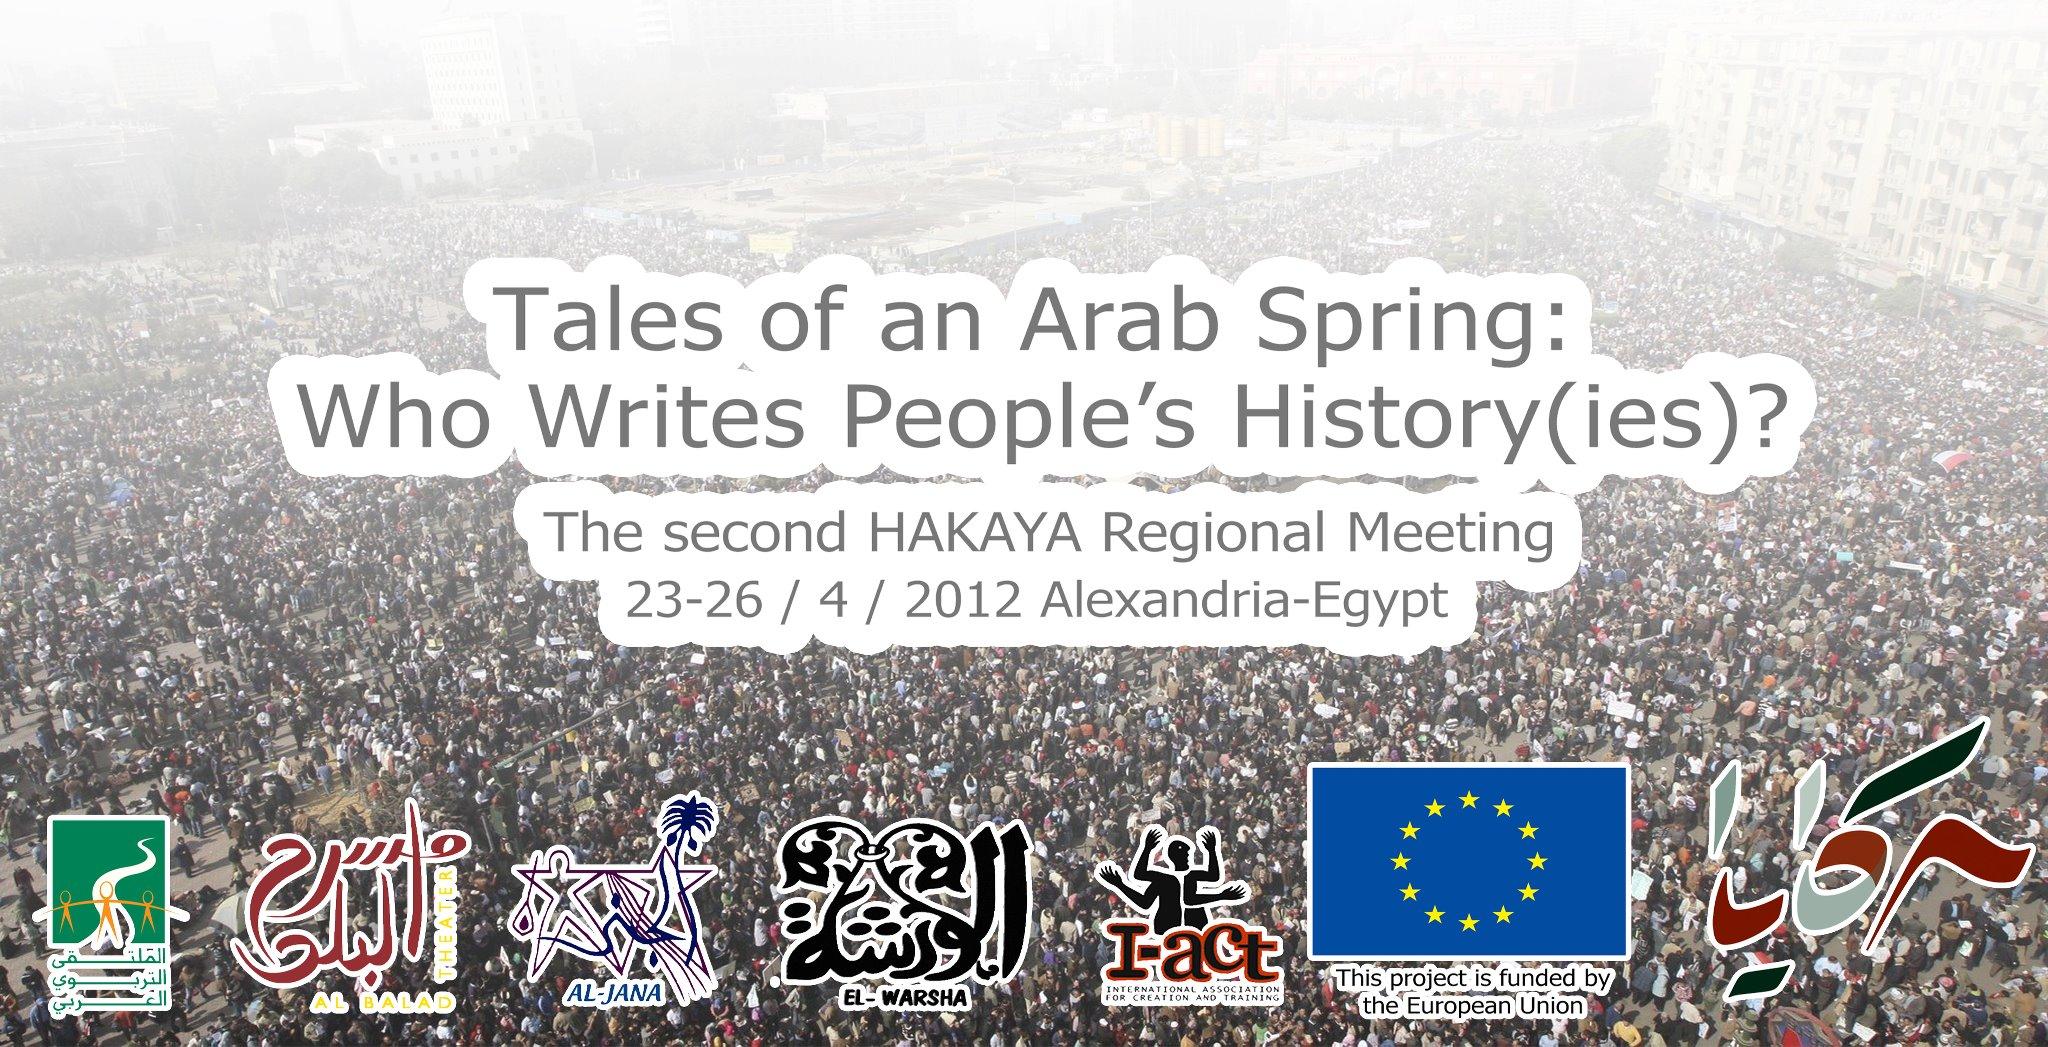 hakaya meeting